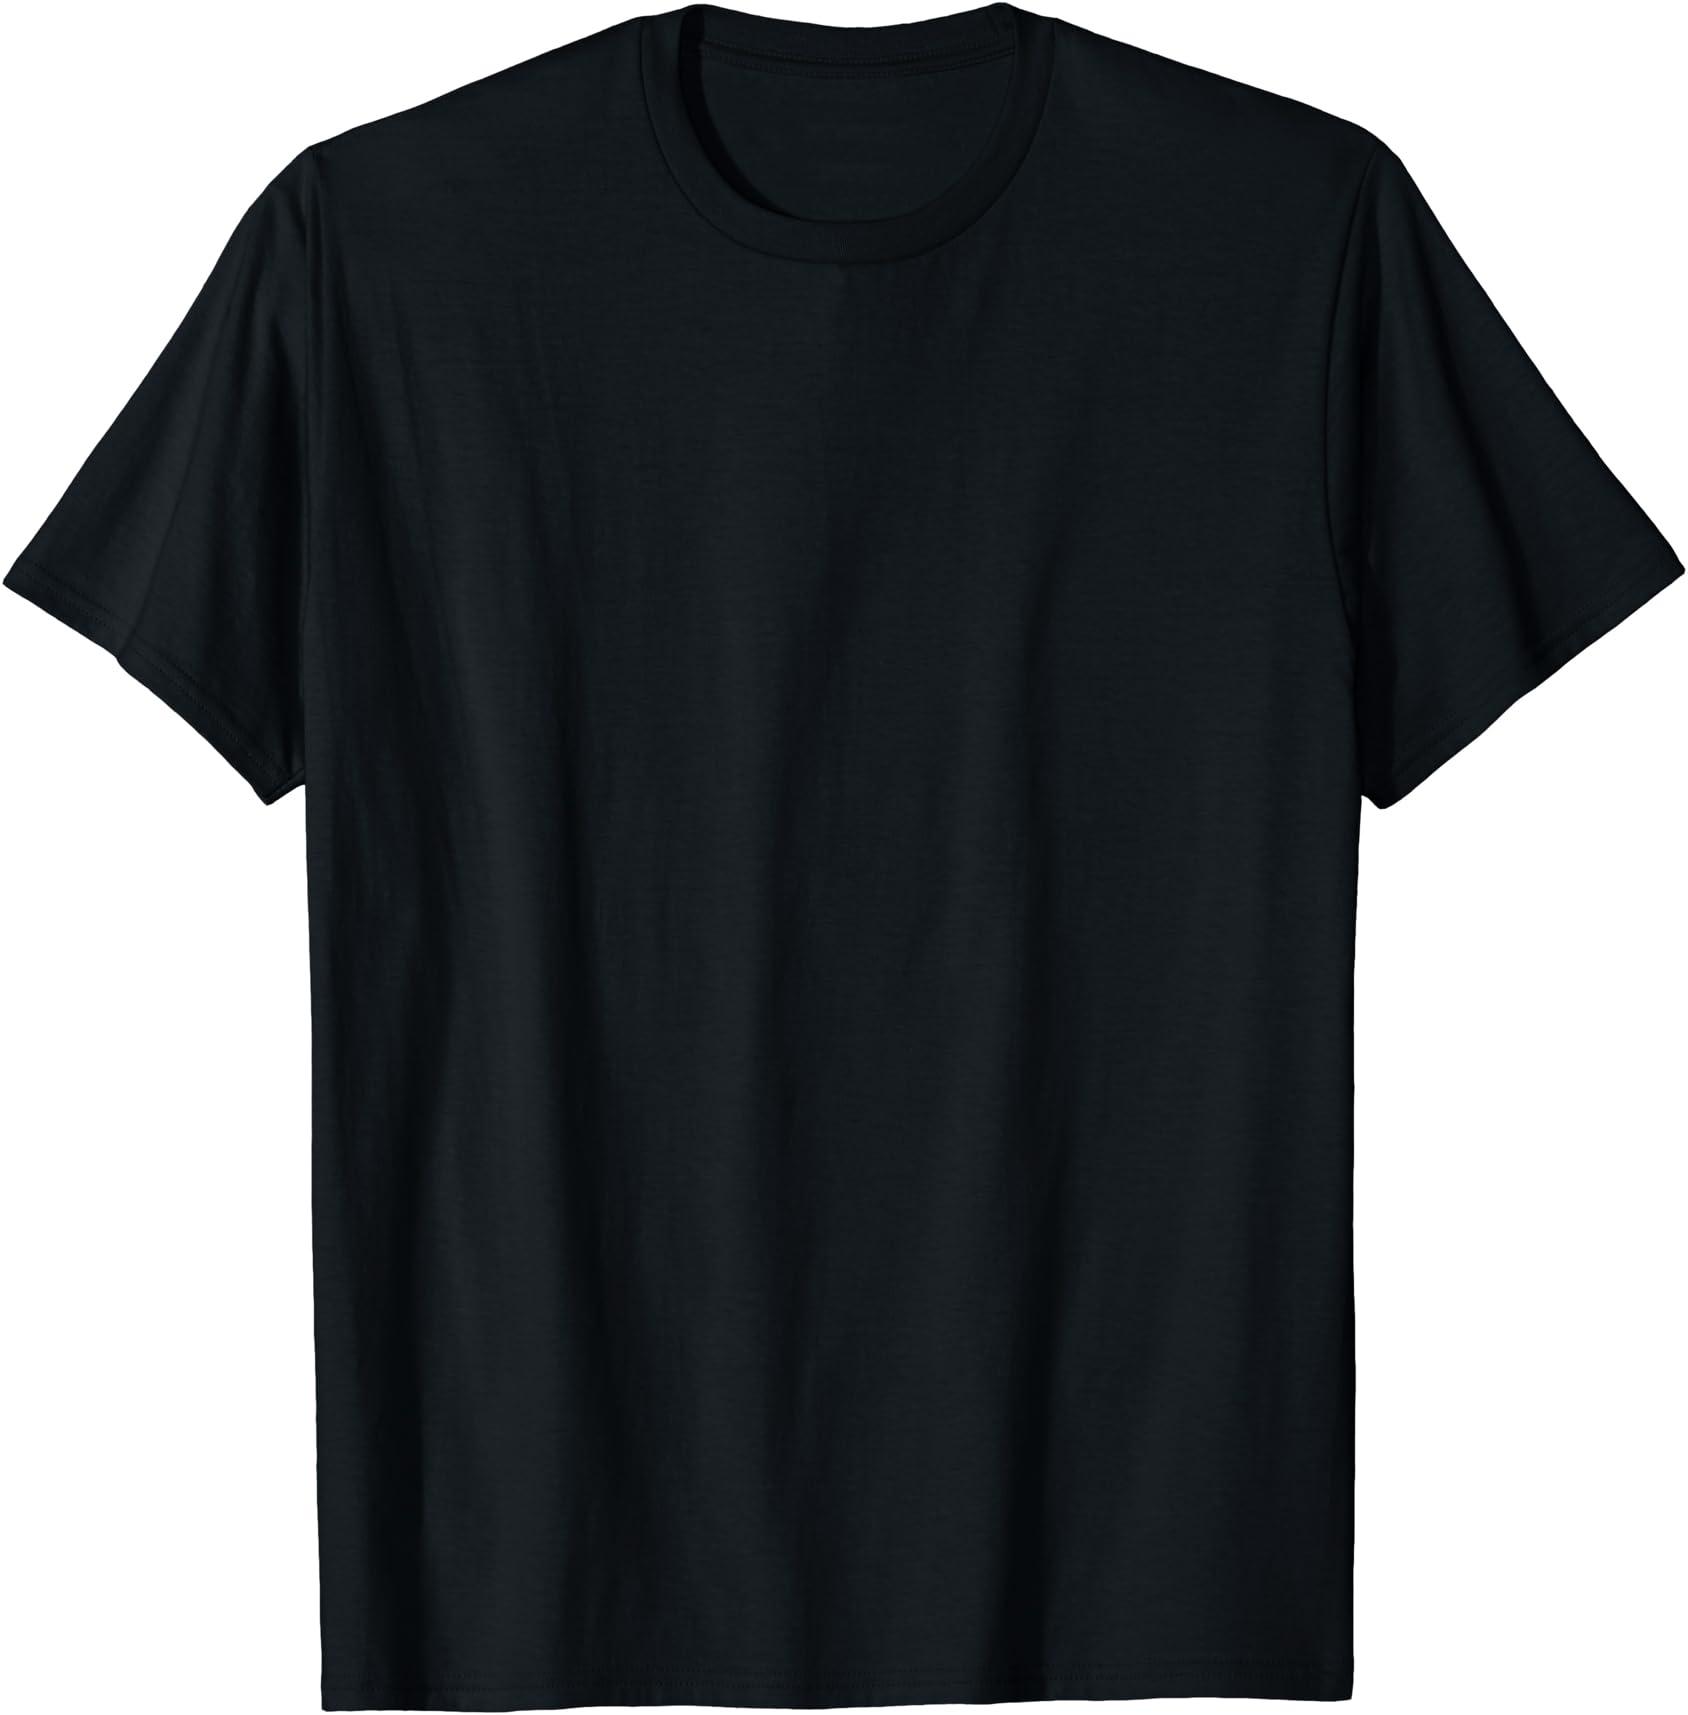 LEGEND SINCE 1964 Novelty Themed Men/'s T-Shirt Birth Year //Birthday Gift